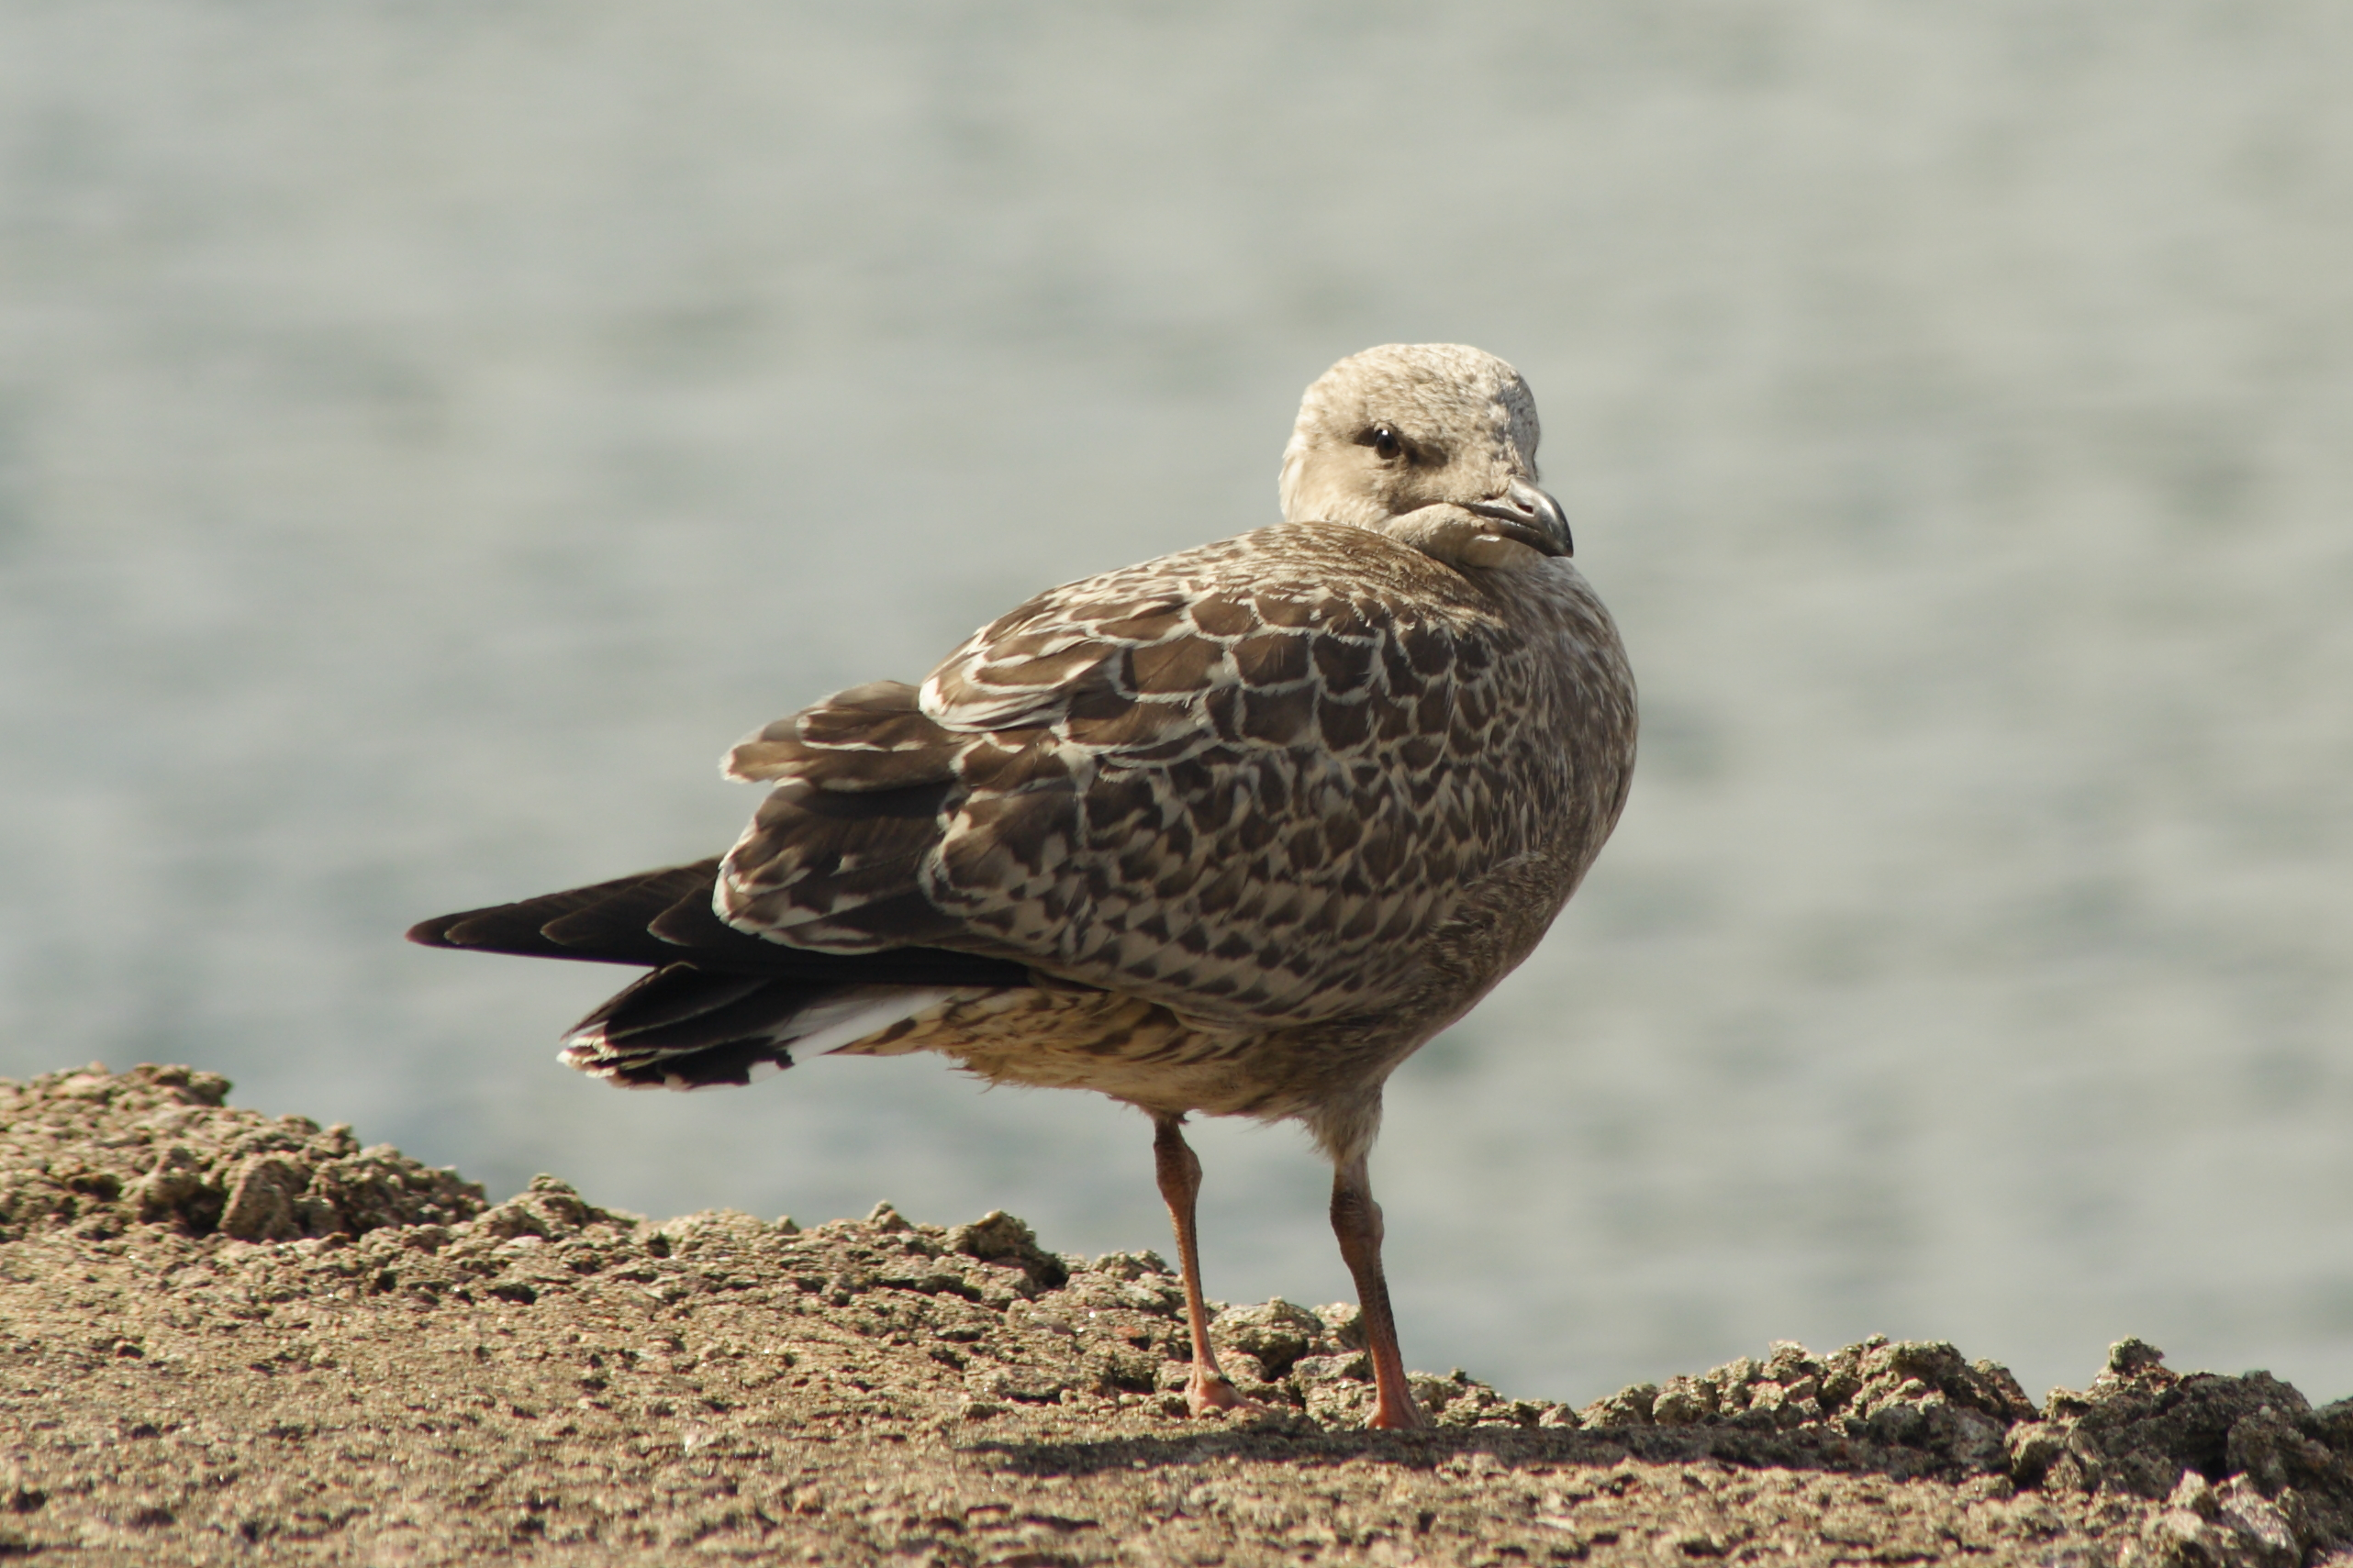 Herring Gull Fledgling Via @Atisgailis